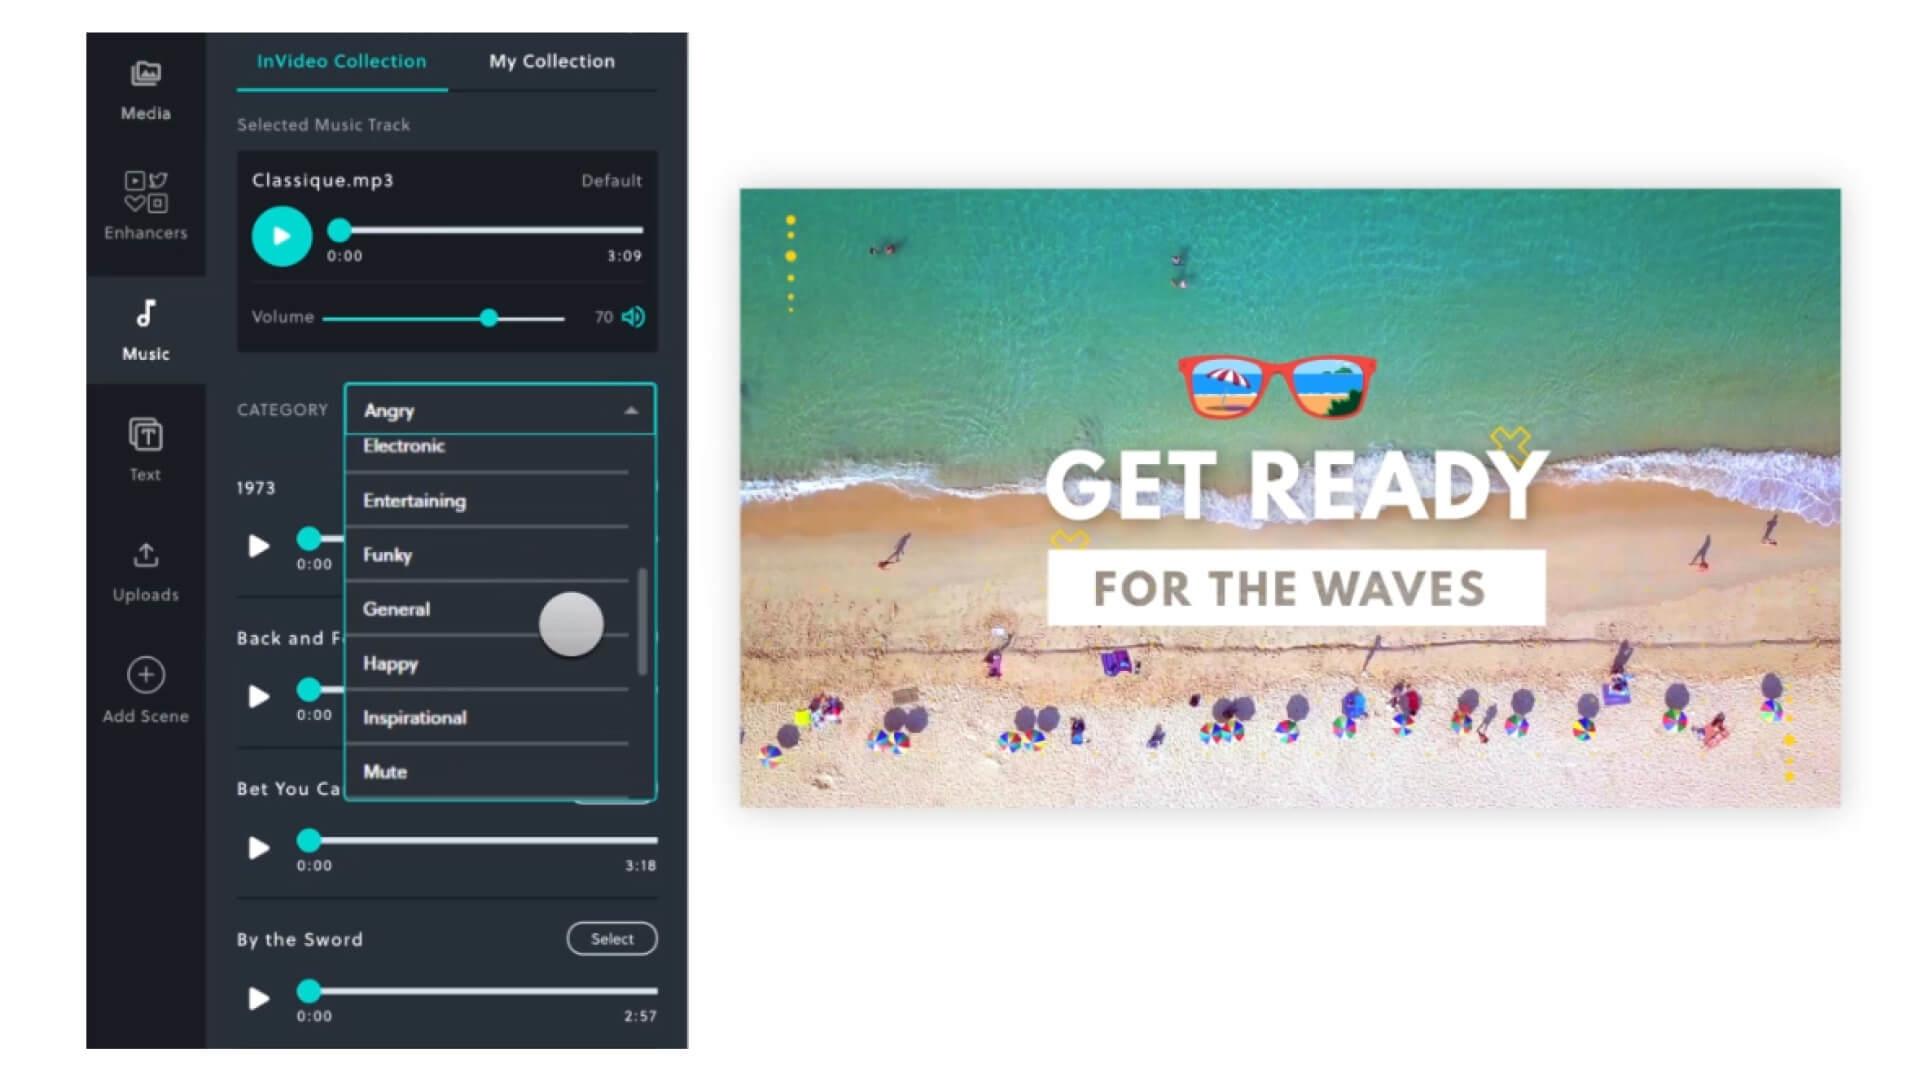 InVideo's AI-powered editor automates video creation process | DeviceDaily.com